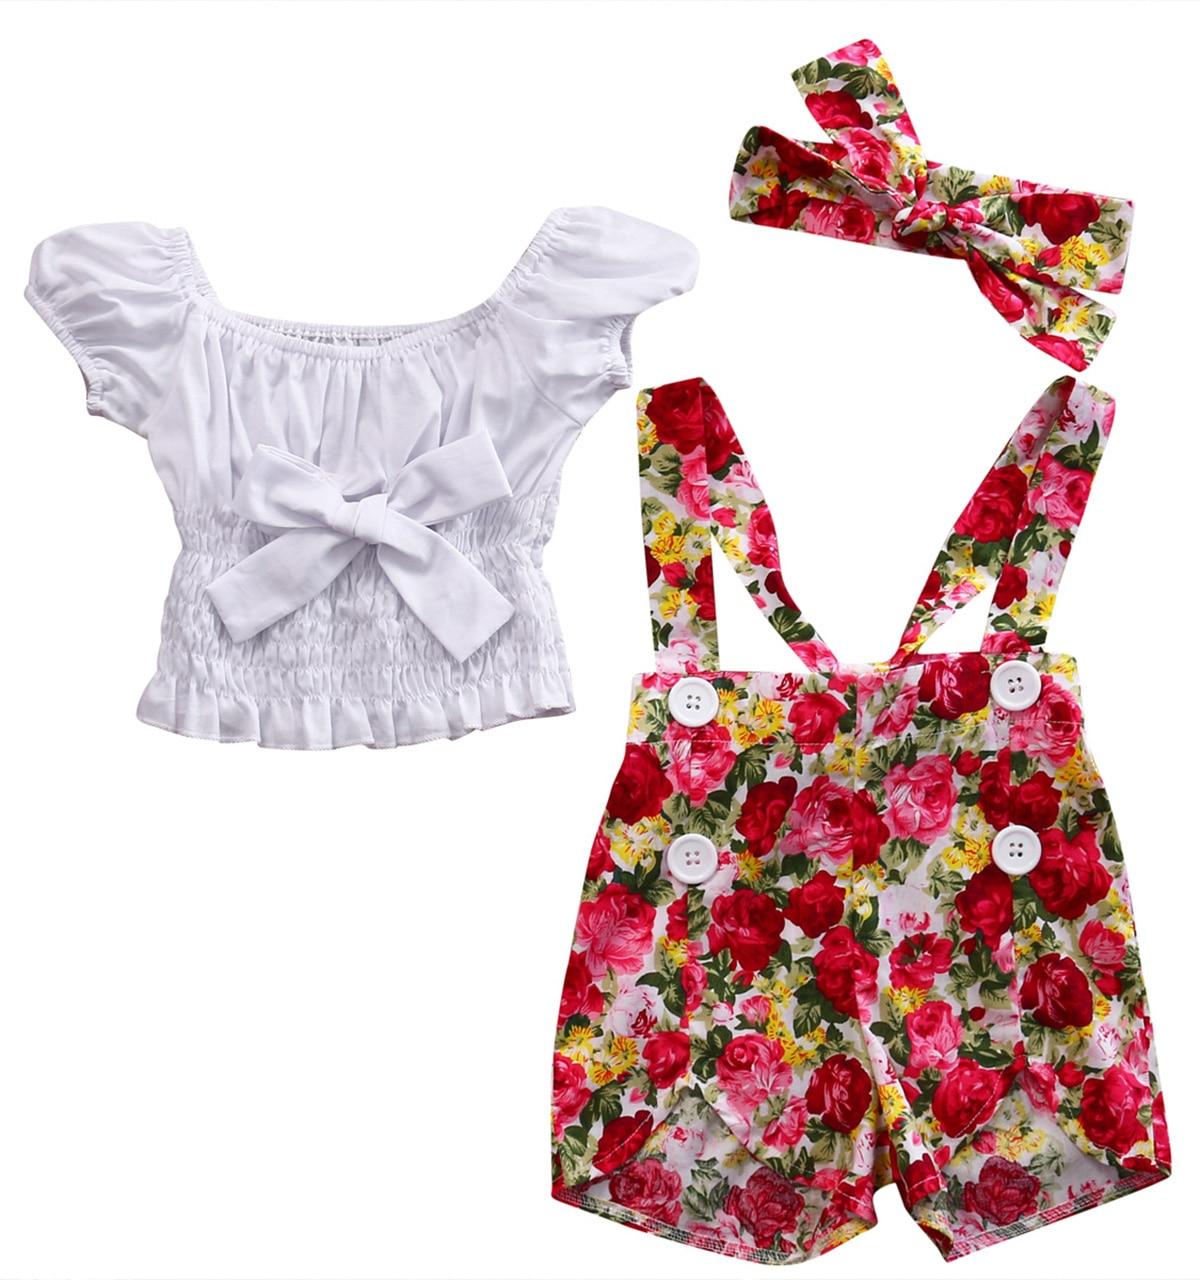 8ab2e9c02319ca Clothing 2Pcs Kids Toddler Girl Summer Cute Off-Shoulder Striped T-Shirt  Tops Pants Set Outfits FeiliandaJJ Baby ...